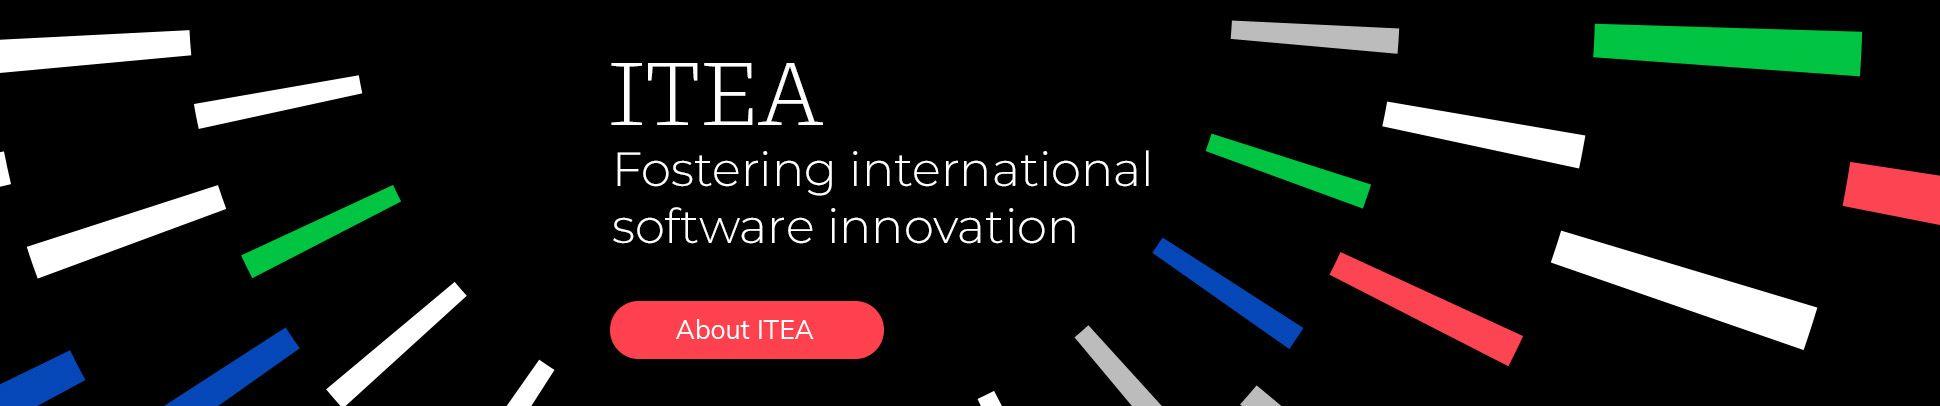 jumbotron_ITEA - home of software innovation_1940x406 - black star beams.jpg